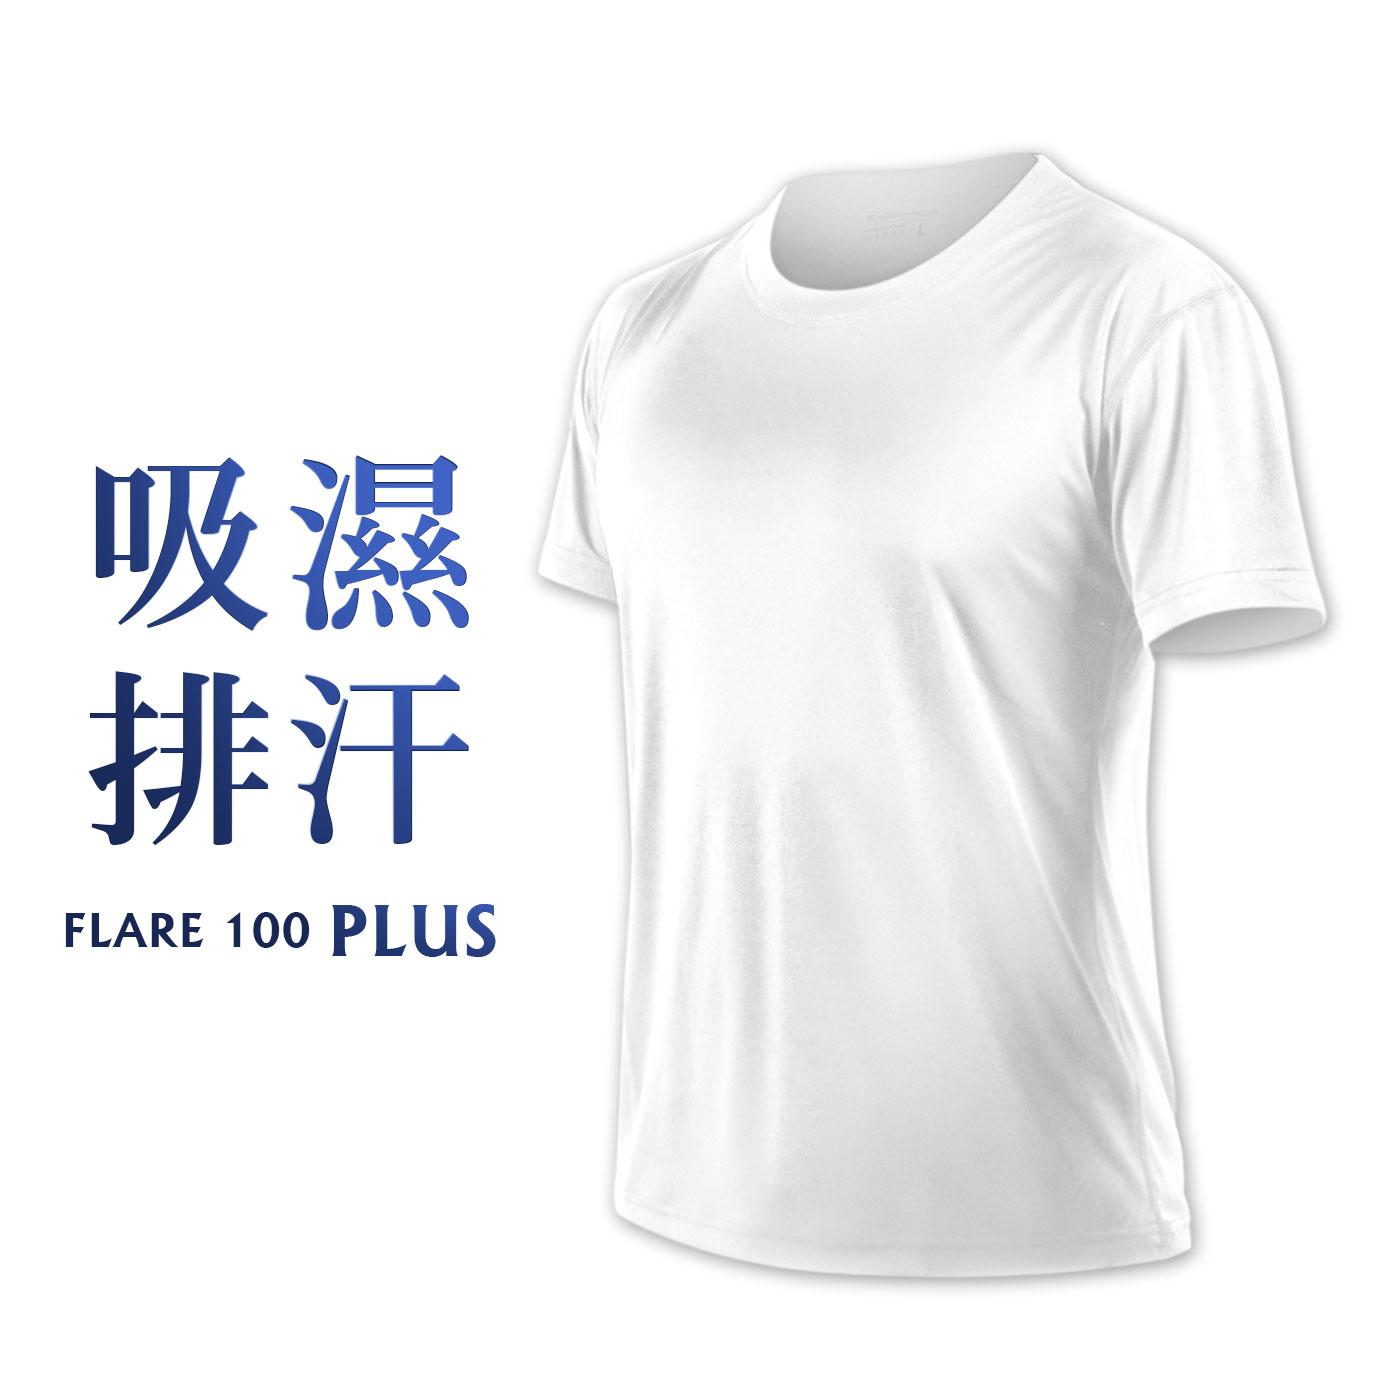 HODARLA FLARE 100 PLUS 吸濕排汗衫 3153701 - 白